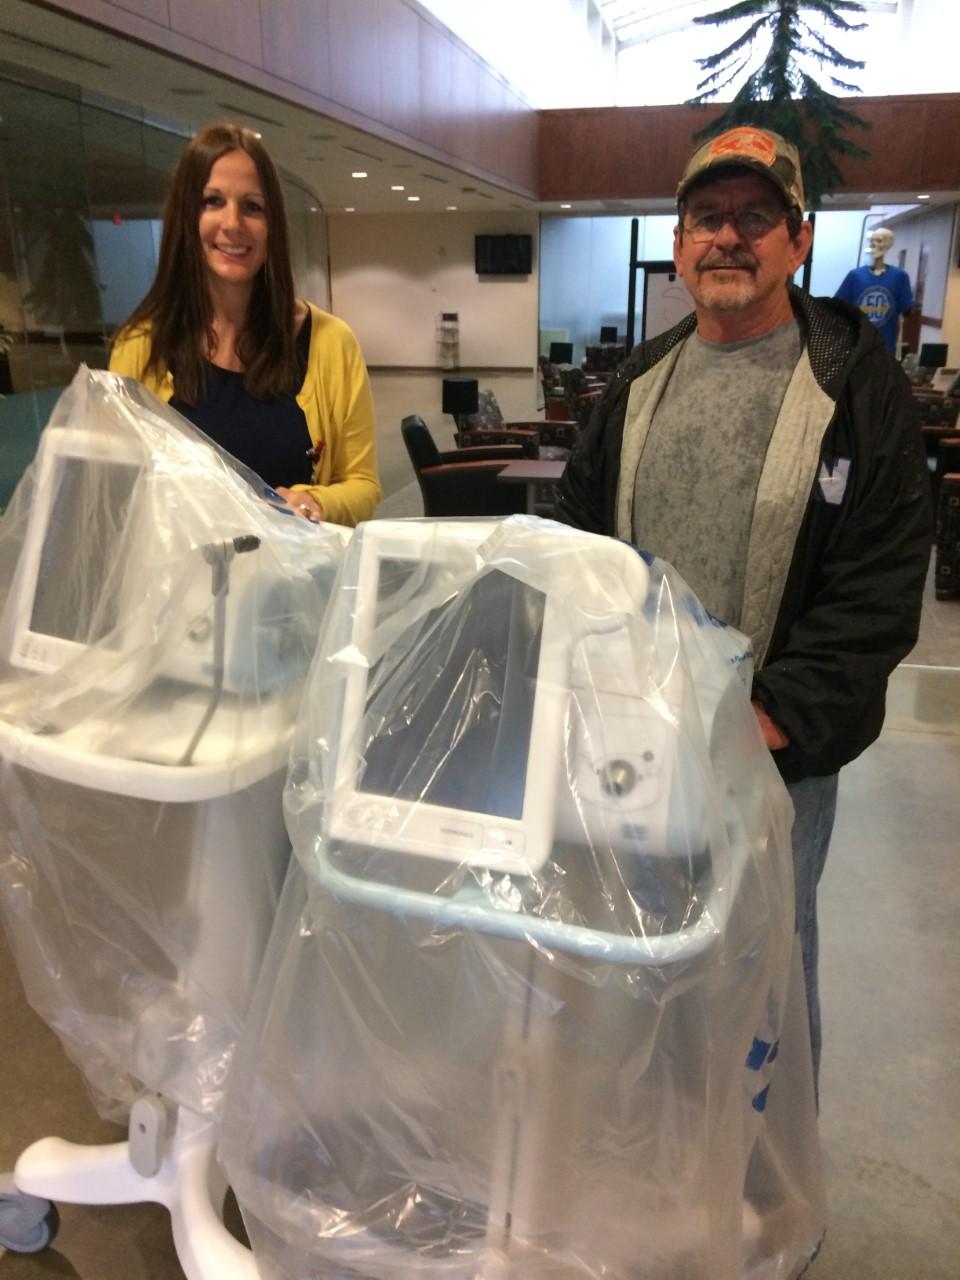 Rose State loaning ventilators